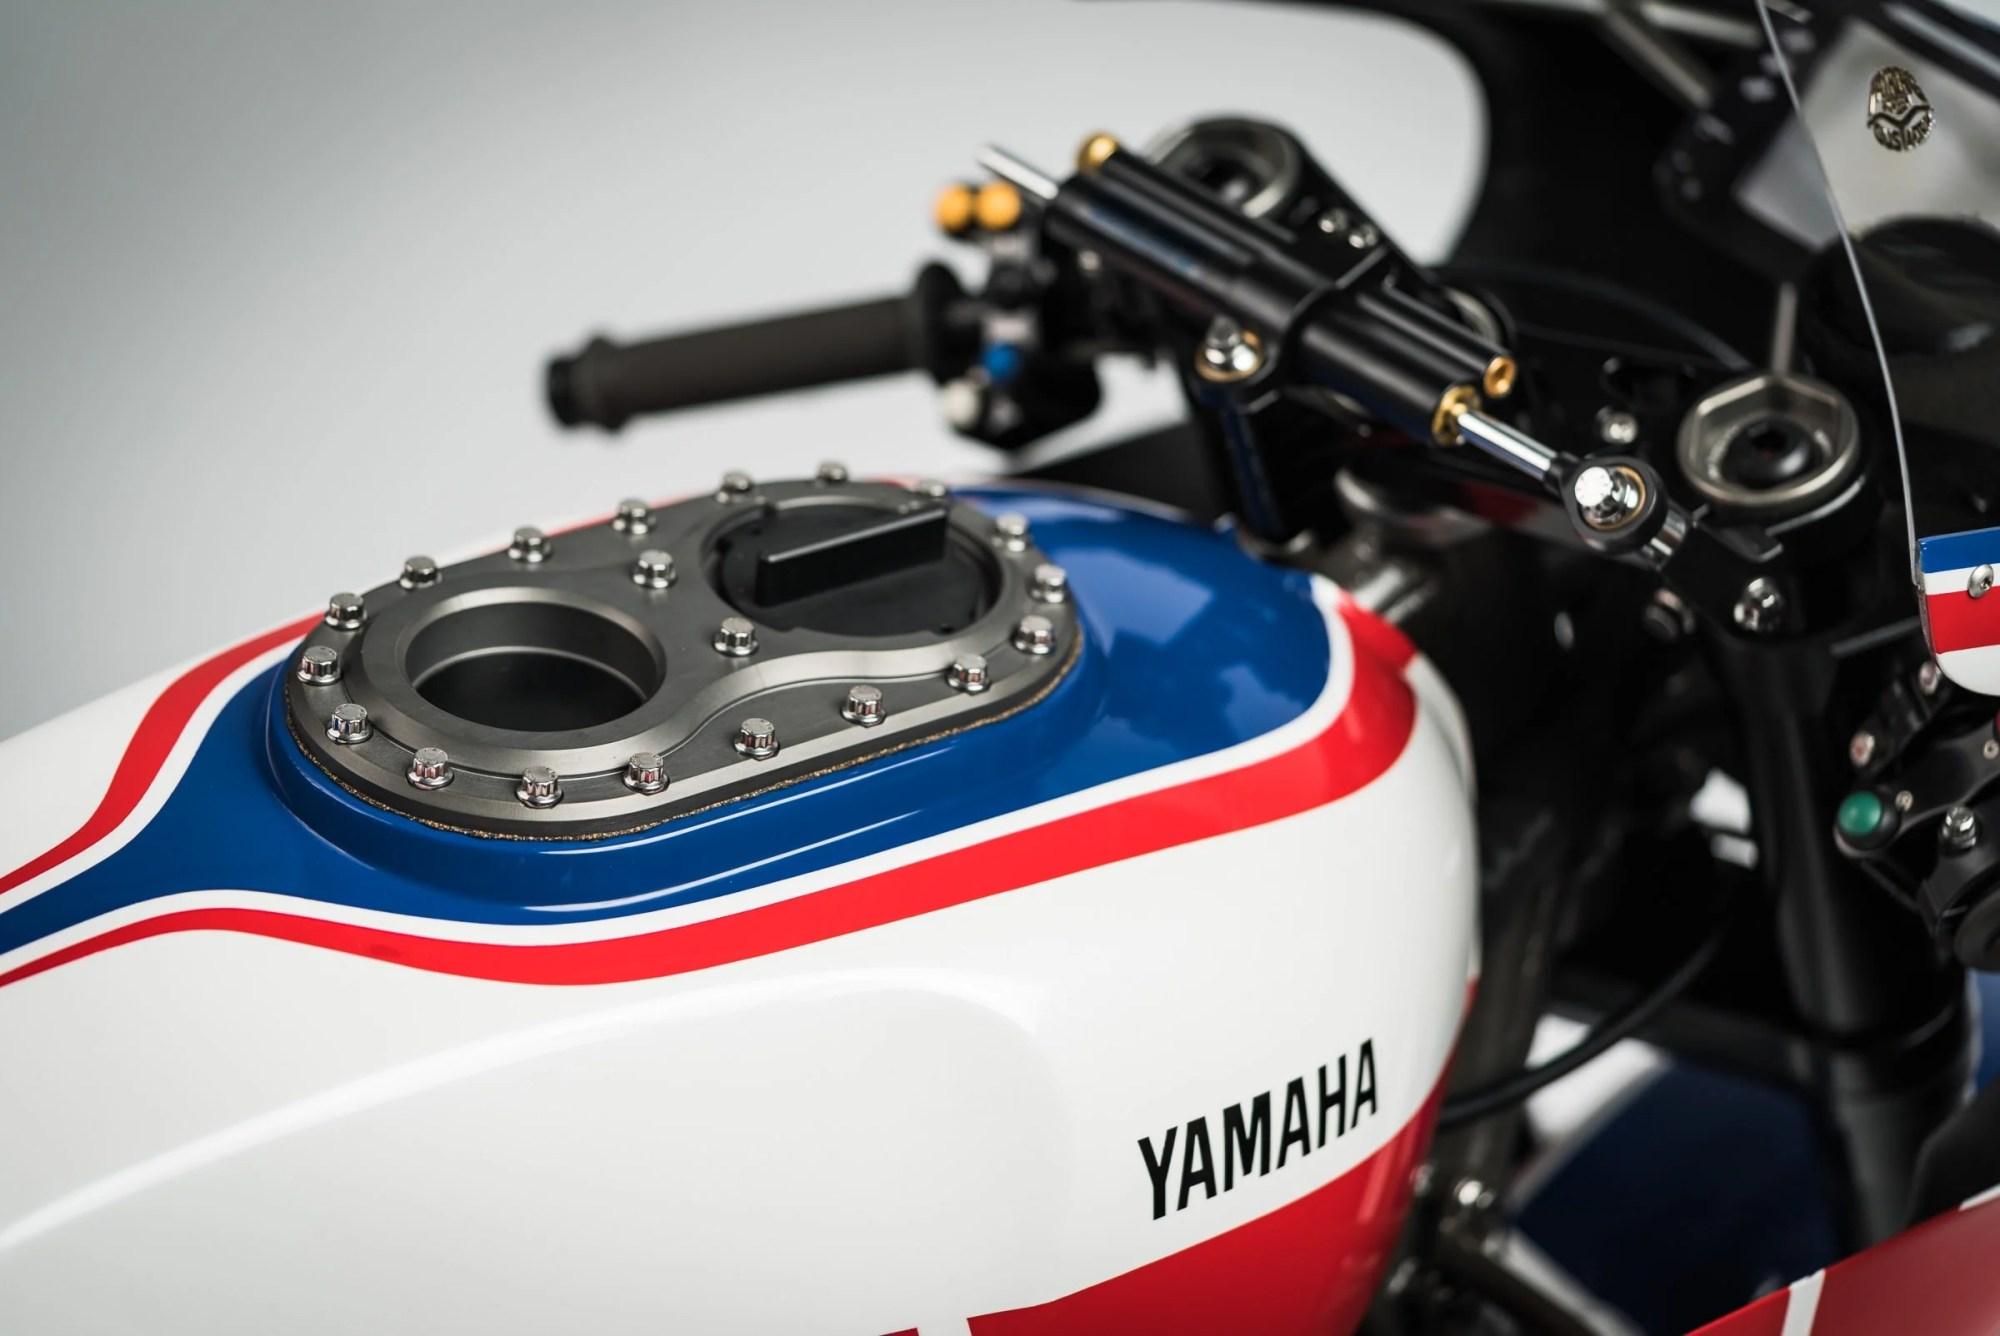 hight resolution of yamaha turbo maximus motorcycle fuel tank